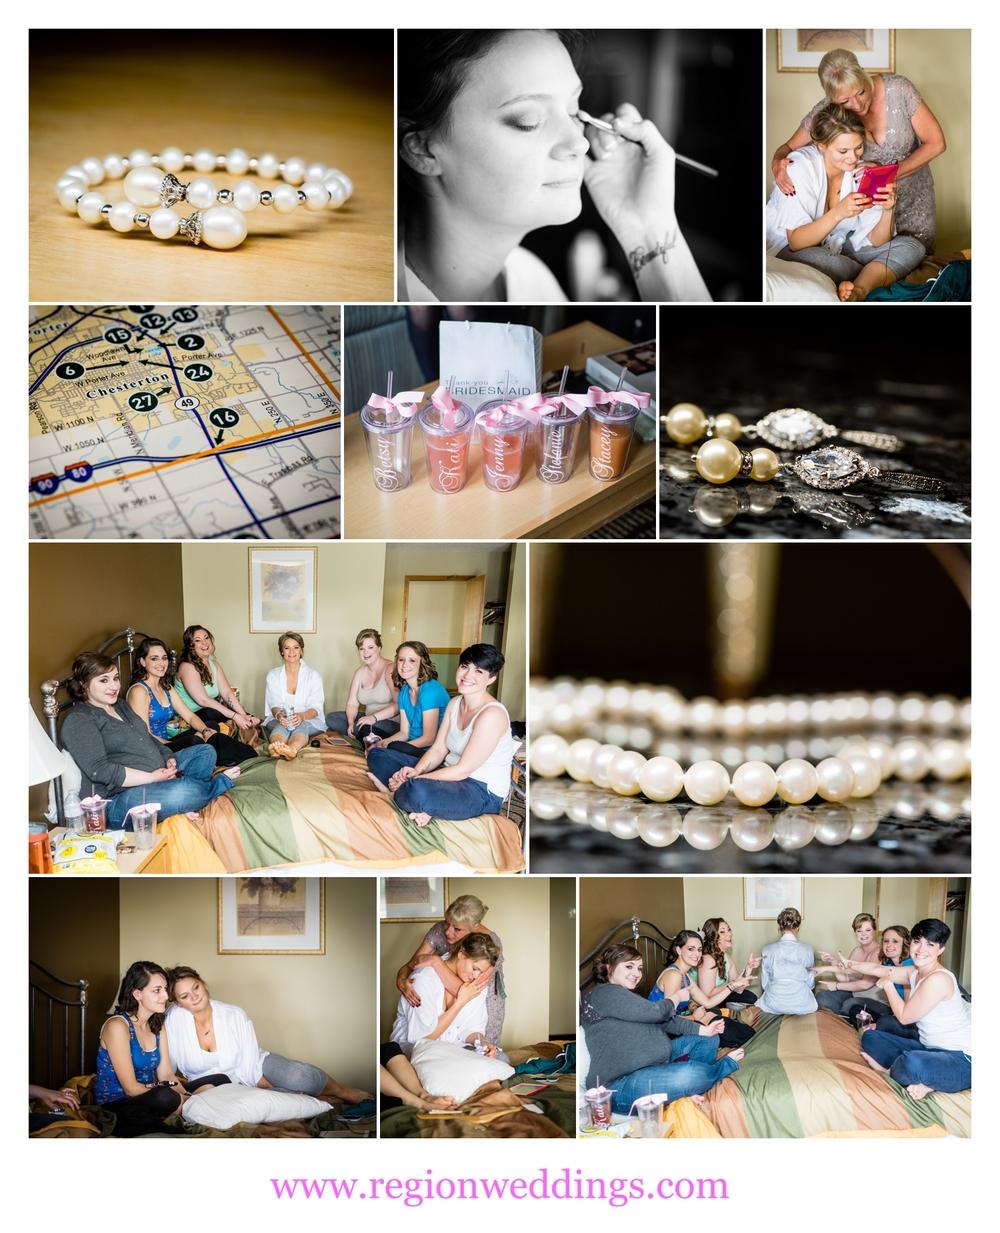 chesterton-wedding-bride-bridesmaids.jpg